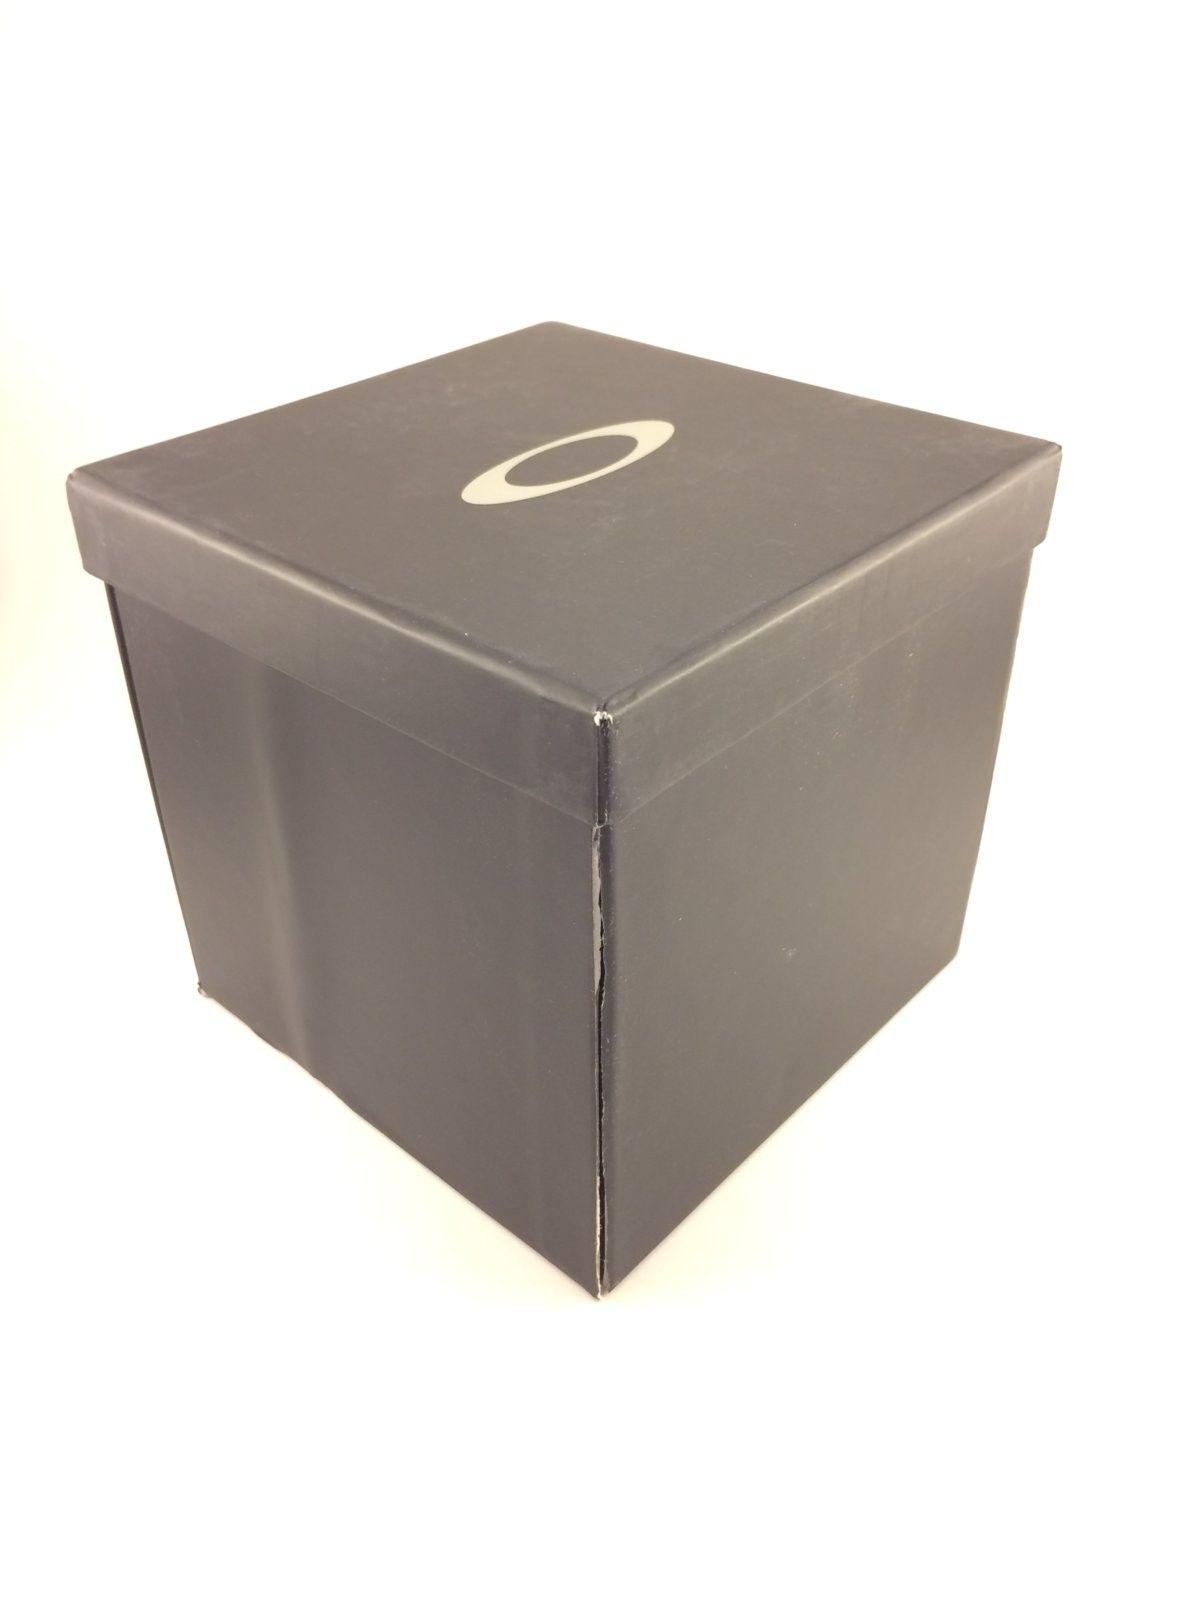 Minute Machine Wooden Box - MM box 698.JPG